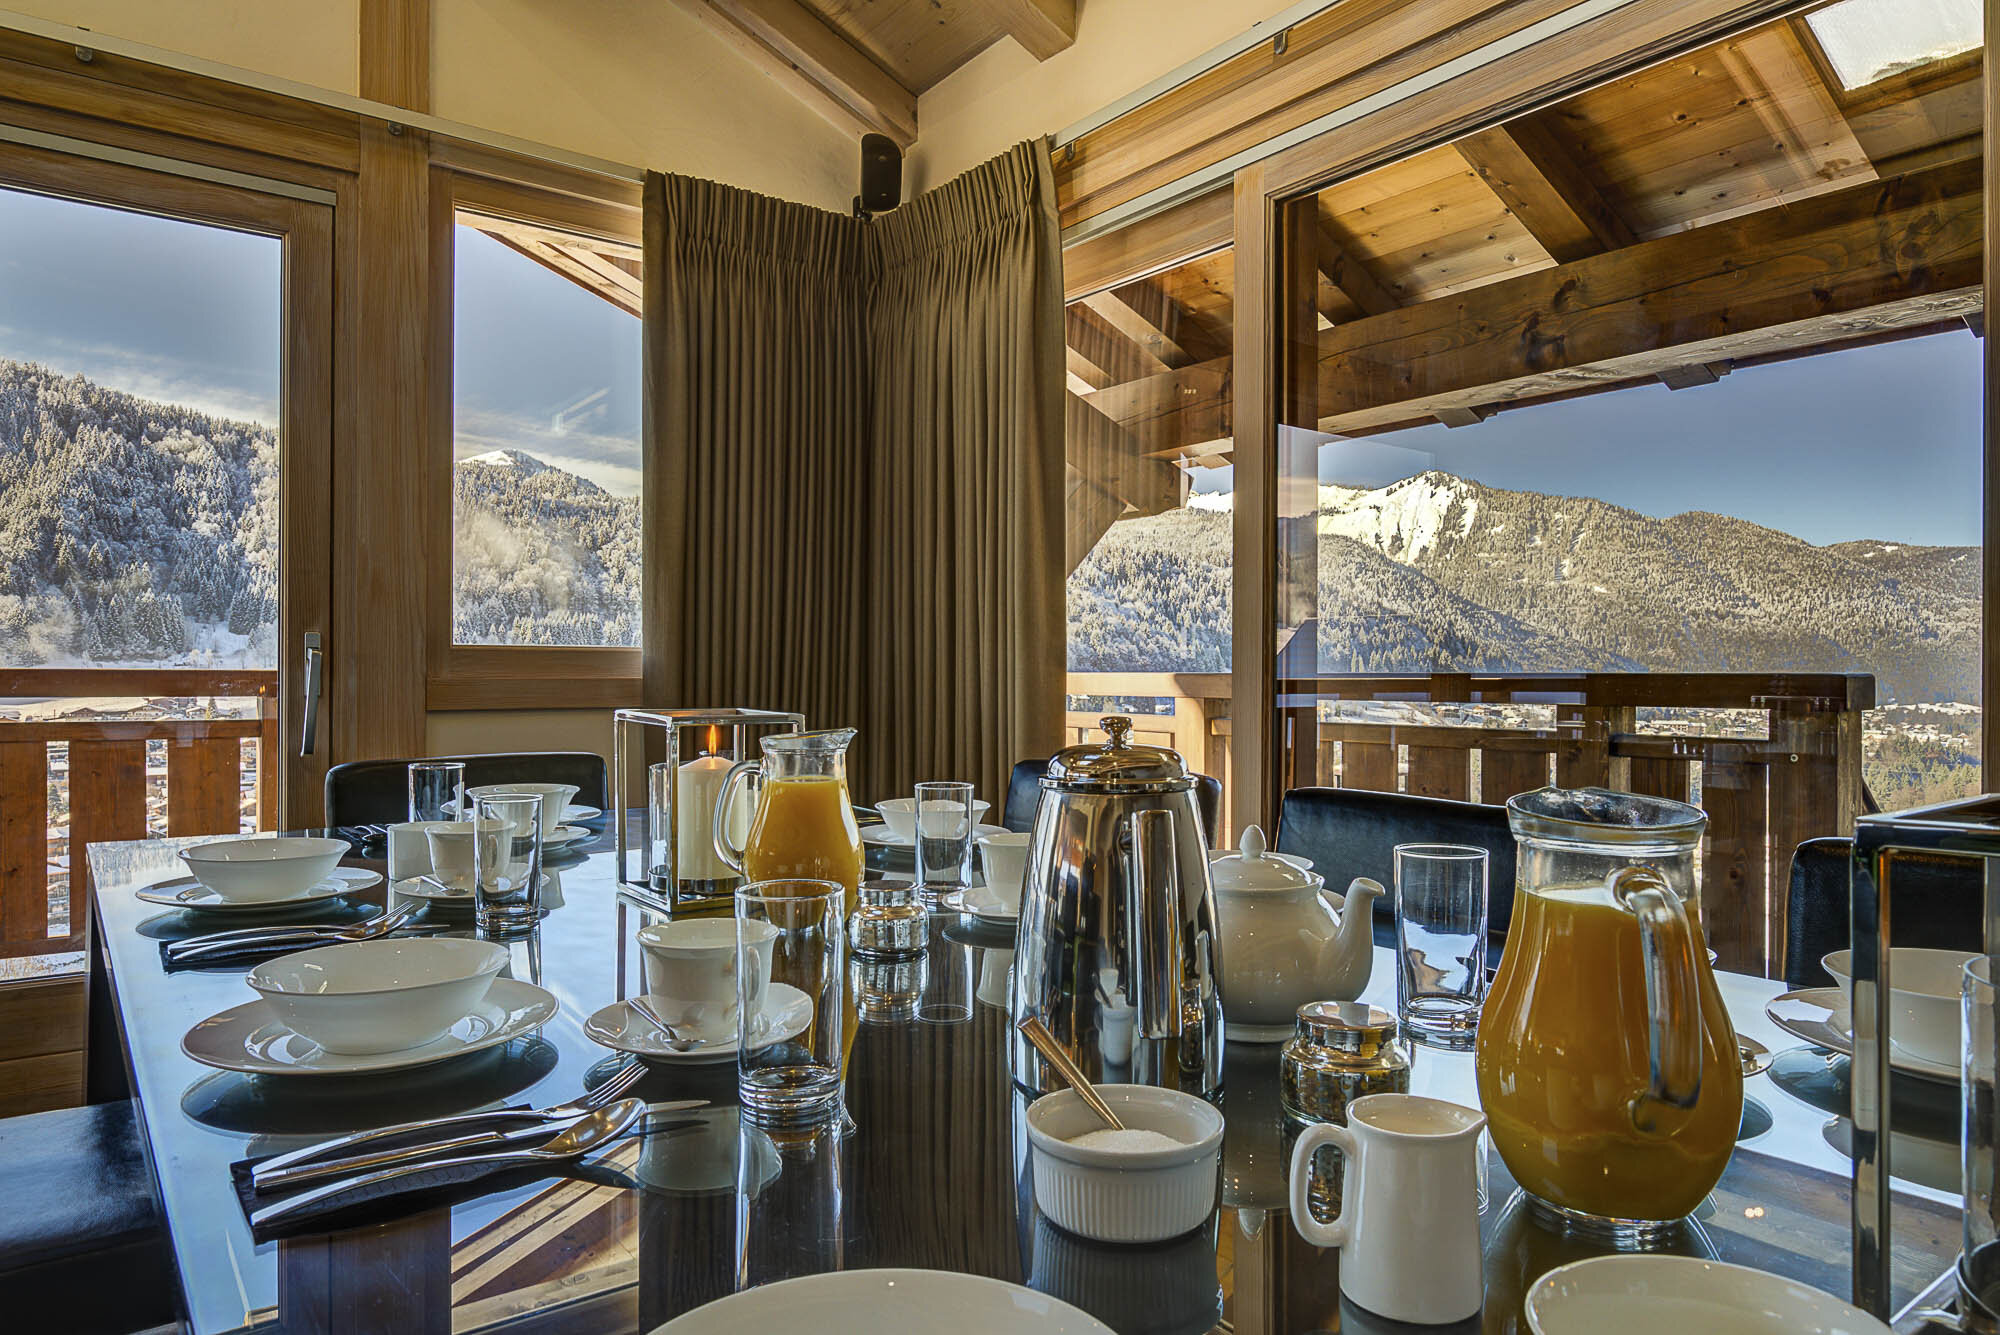 tg-ski-luxury-chalet-bouquetin-morzine-003.jpg